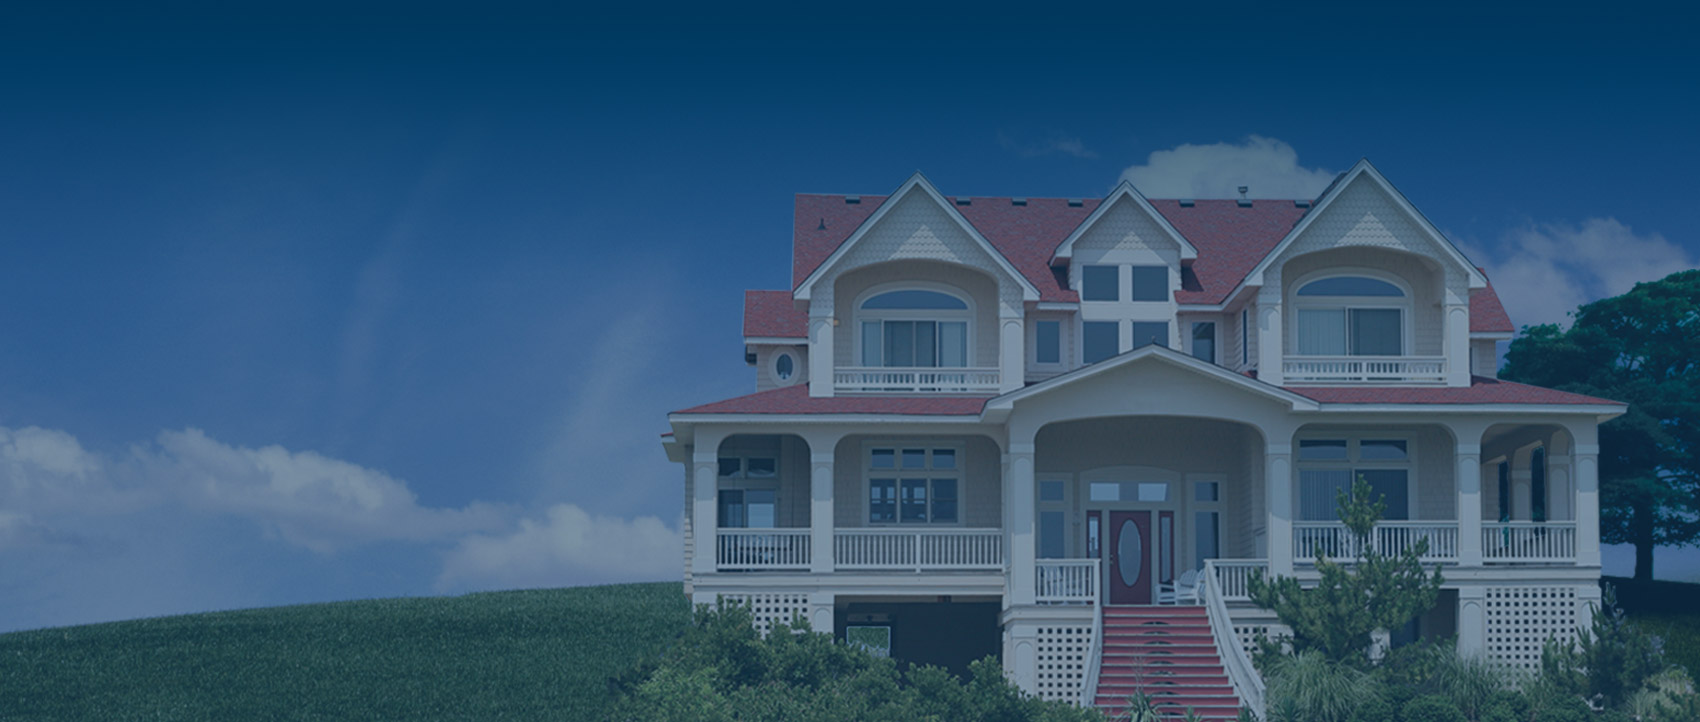 Certified Pre-Owned Home Inspections in Cincinnati